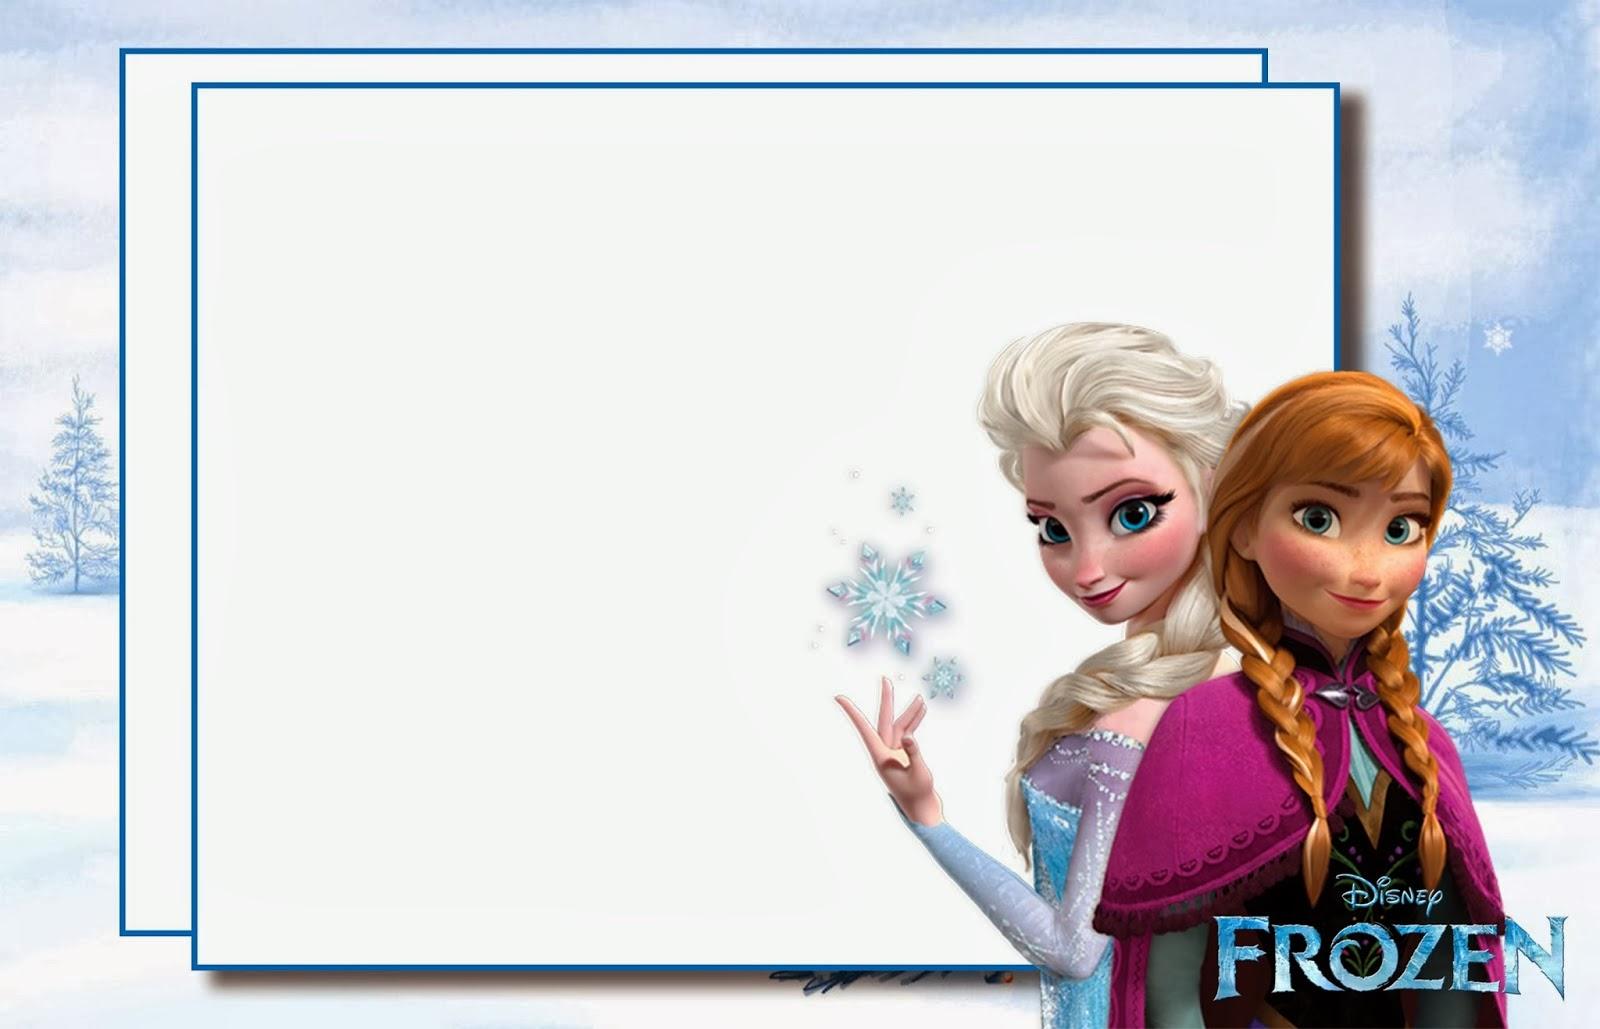 disneyfrozen01